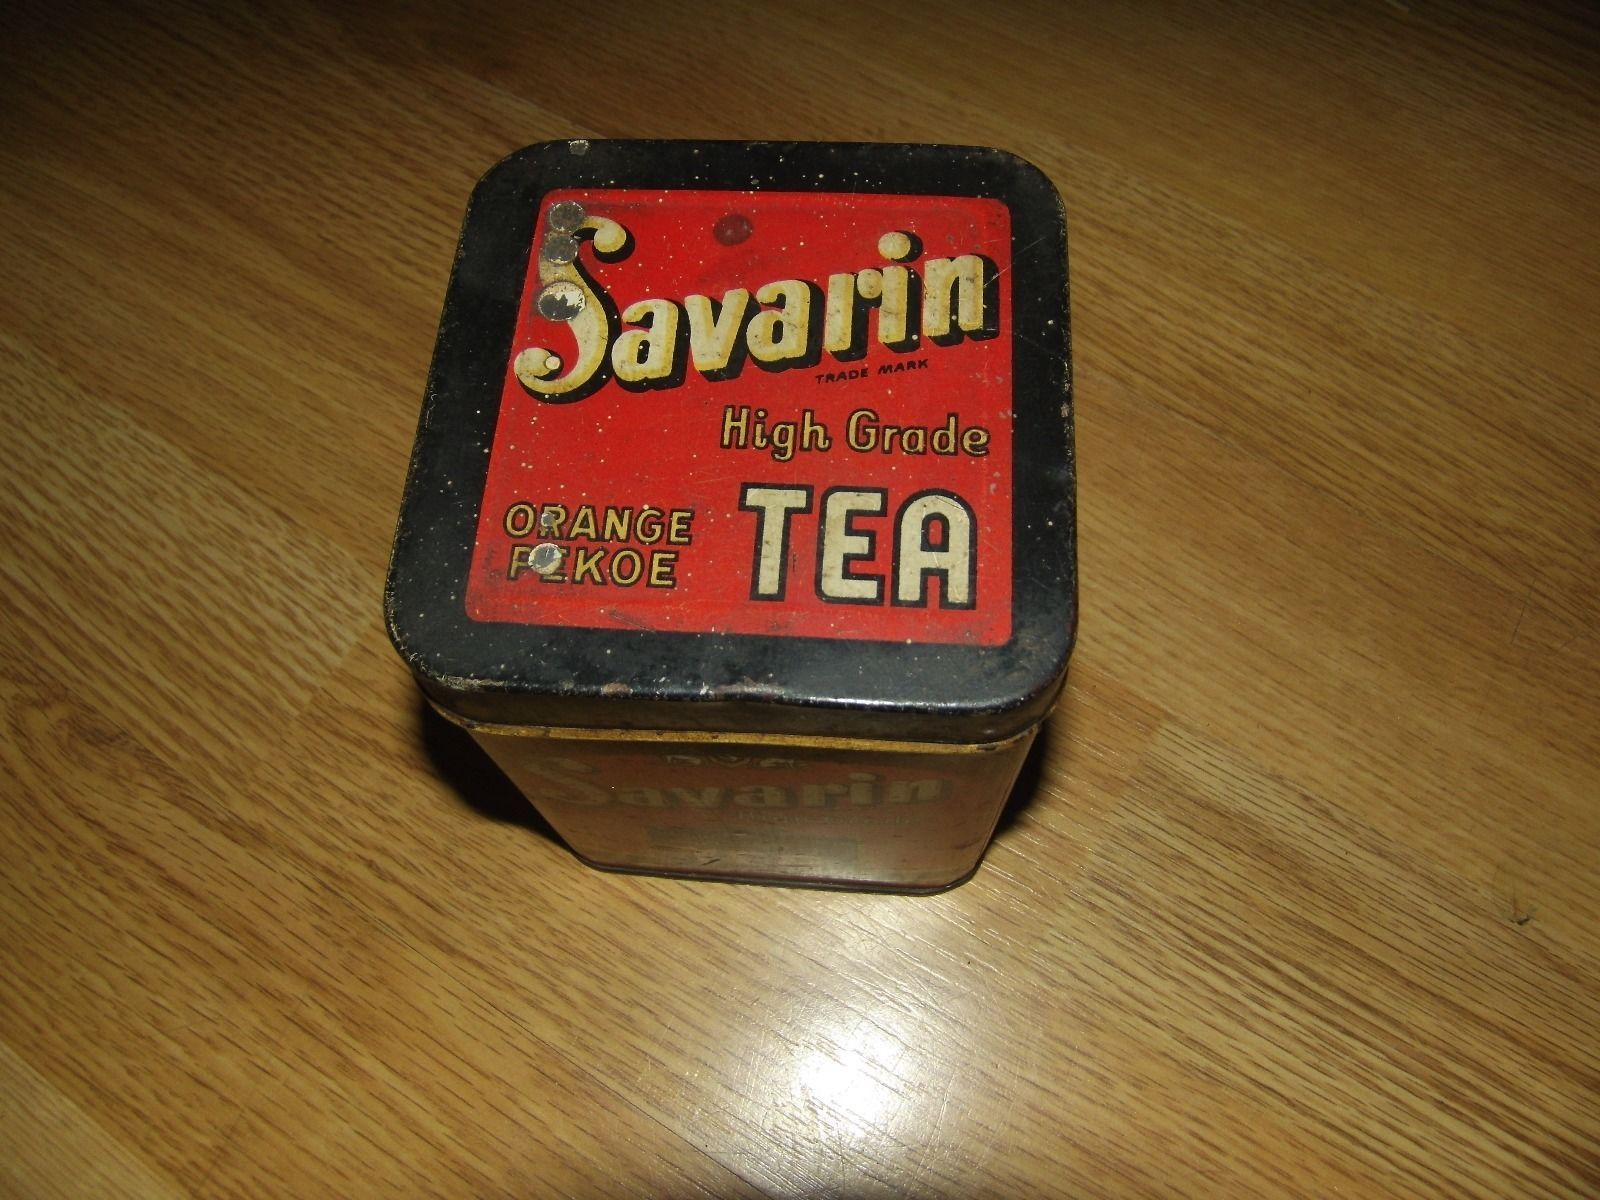 cws pelaw antique.  Antique Cws Pelaw Antique Vintage US Tin Tea Caddy Savarin  EBay Cws Pelaw  Antique To